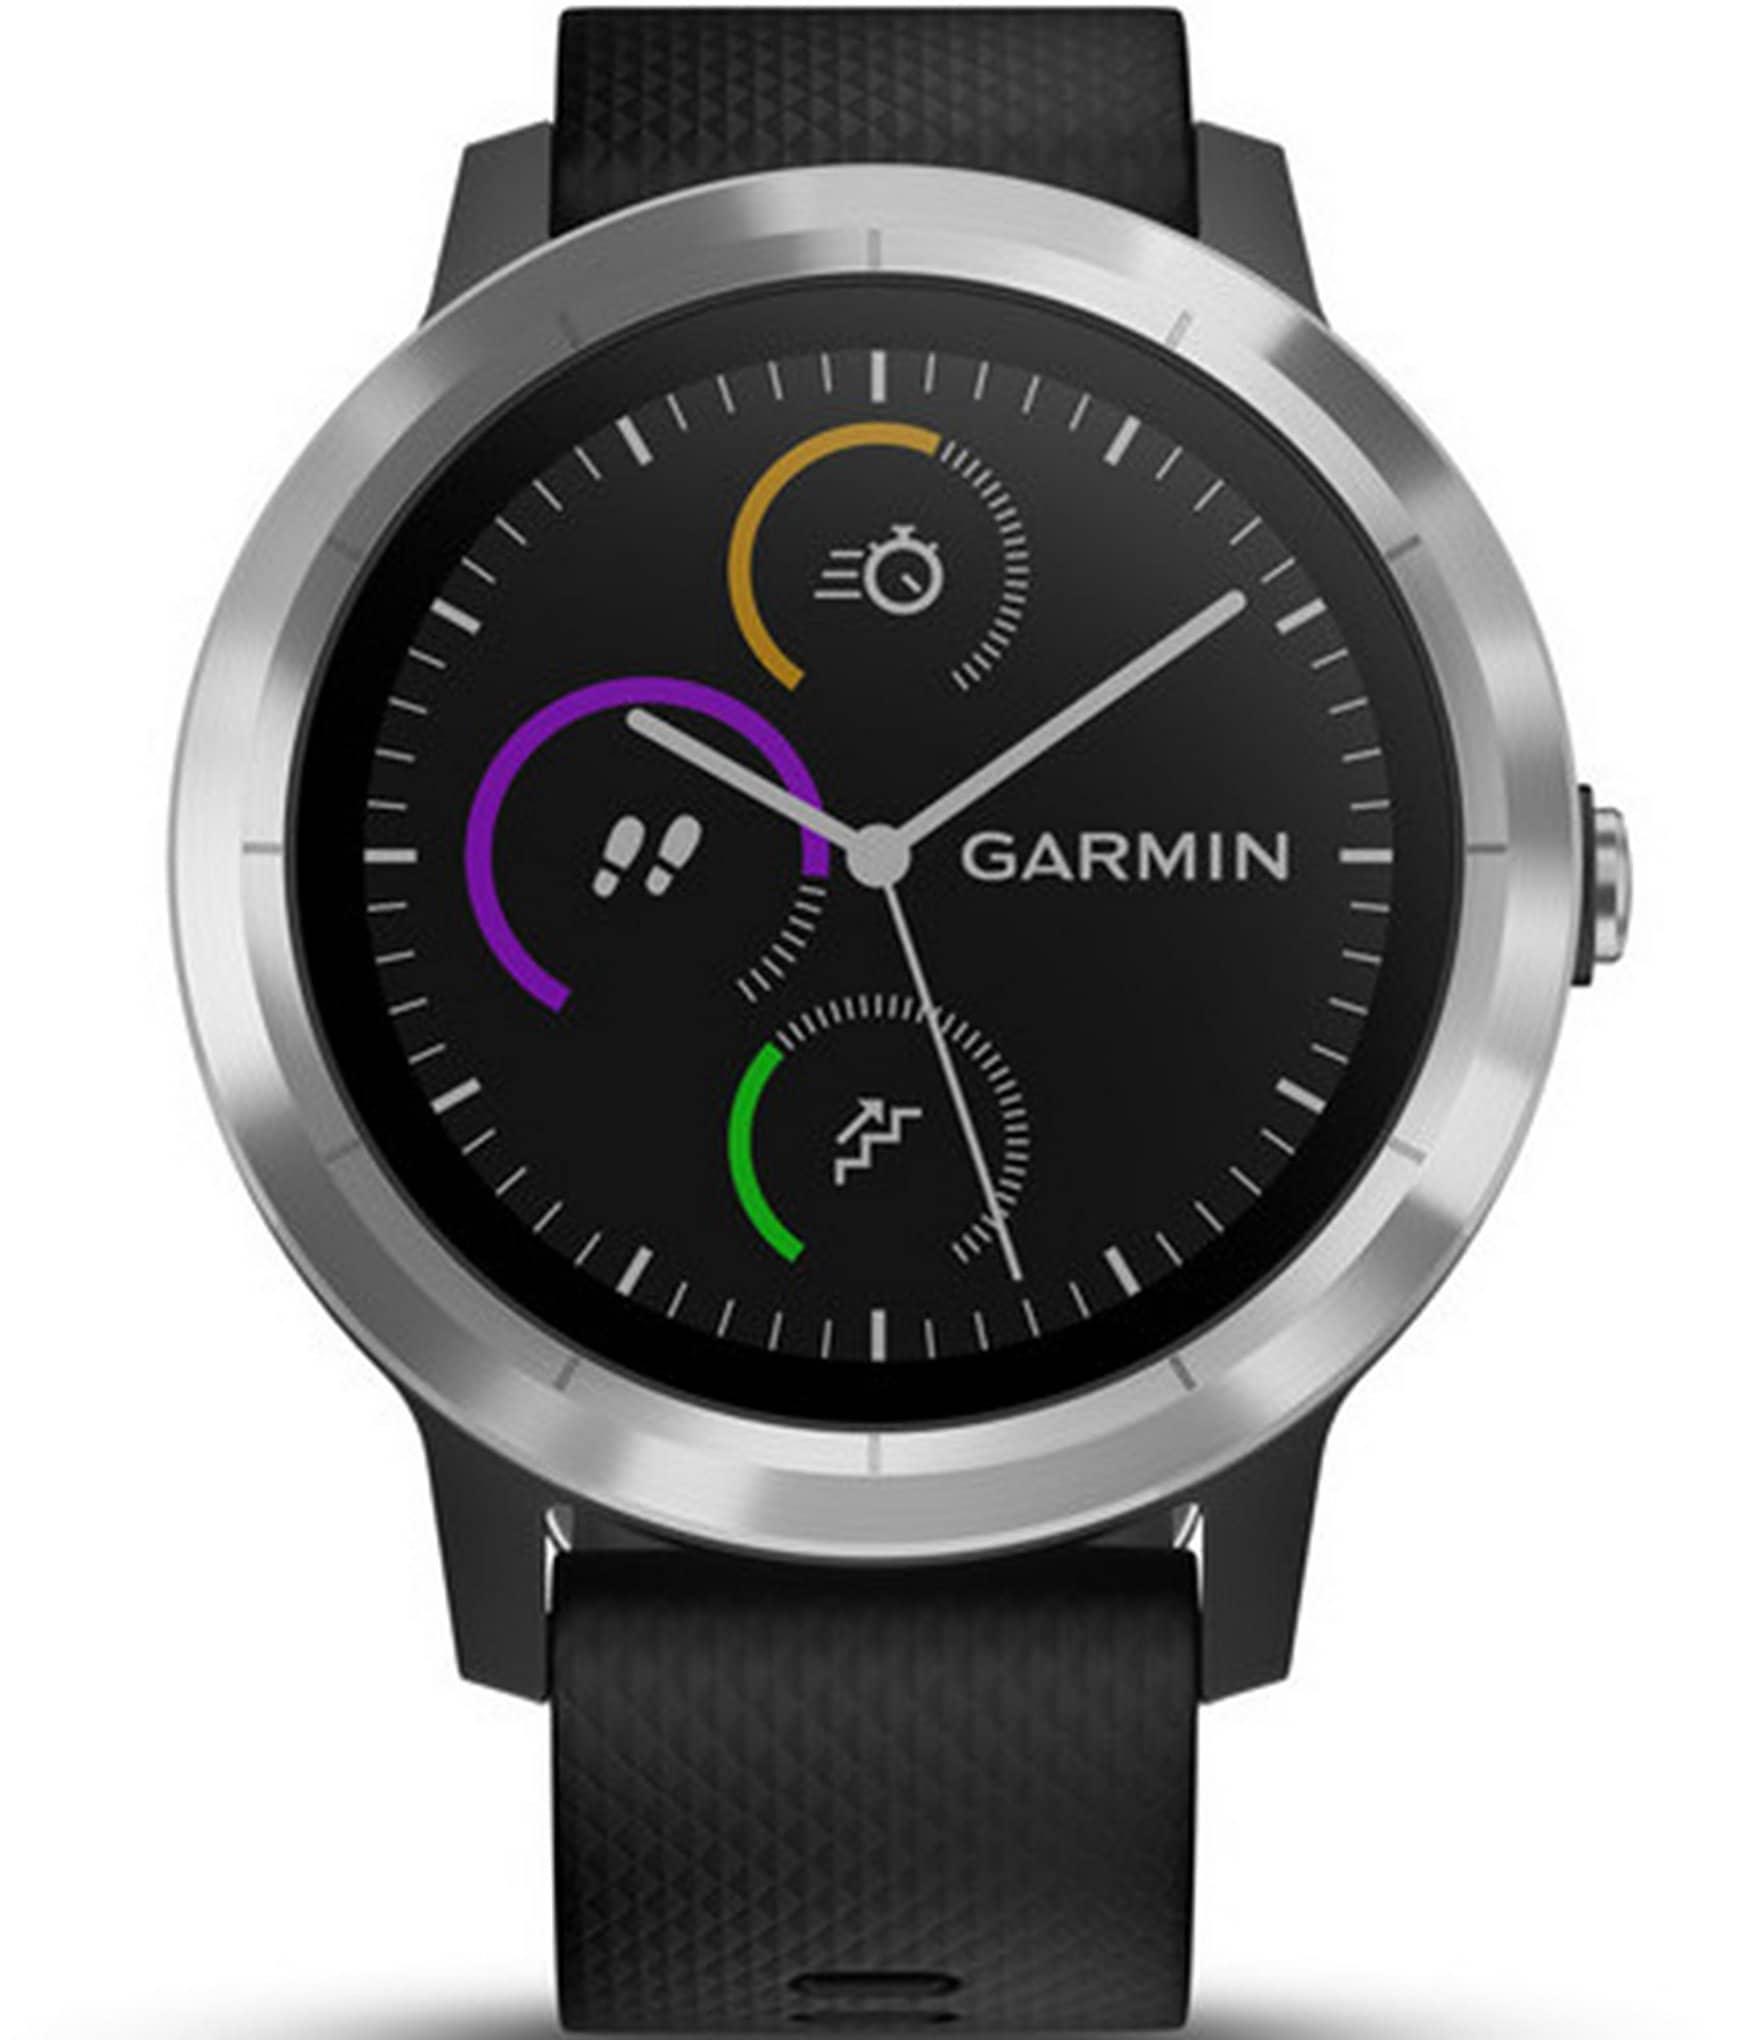 Garmin vivoactive® 3 Smart Watch | Dillard's Kids Swimming Black And White